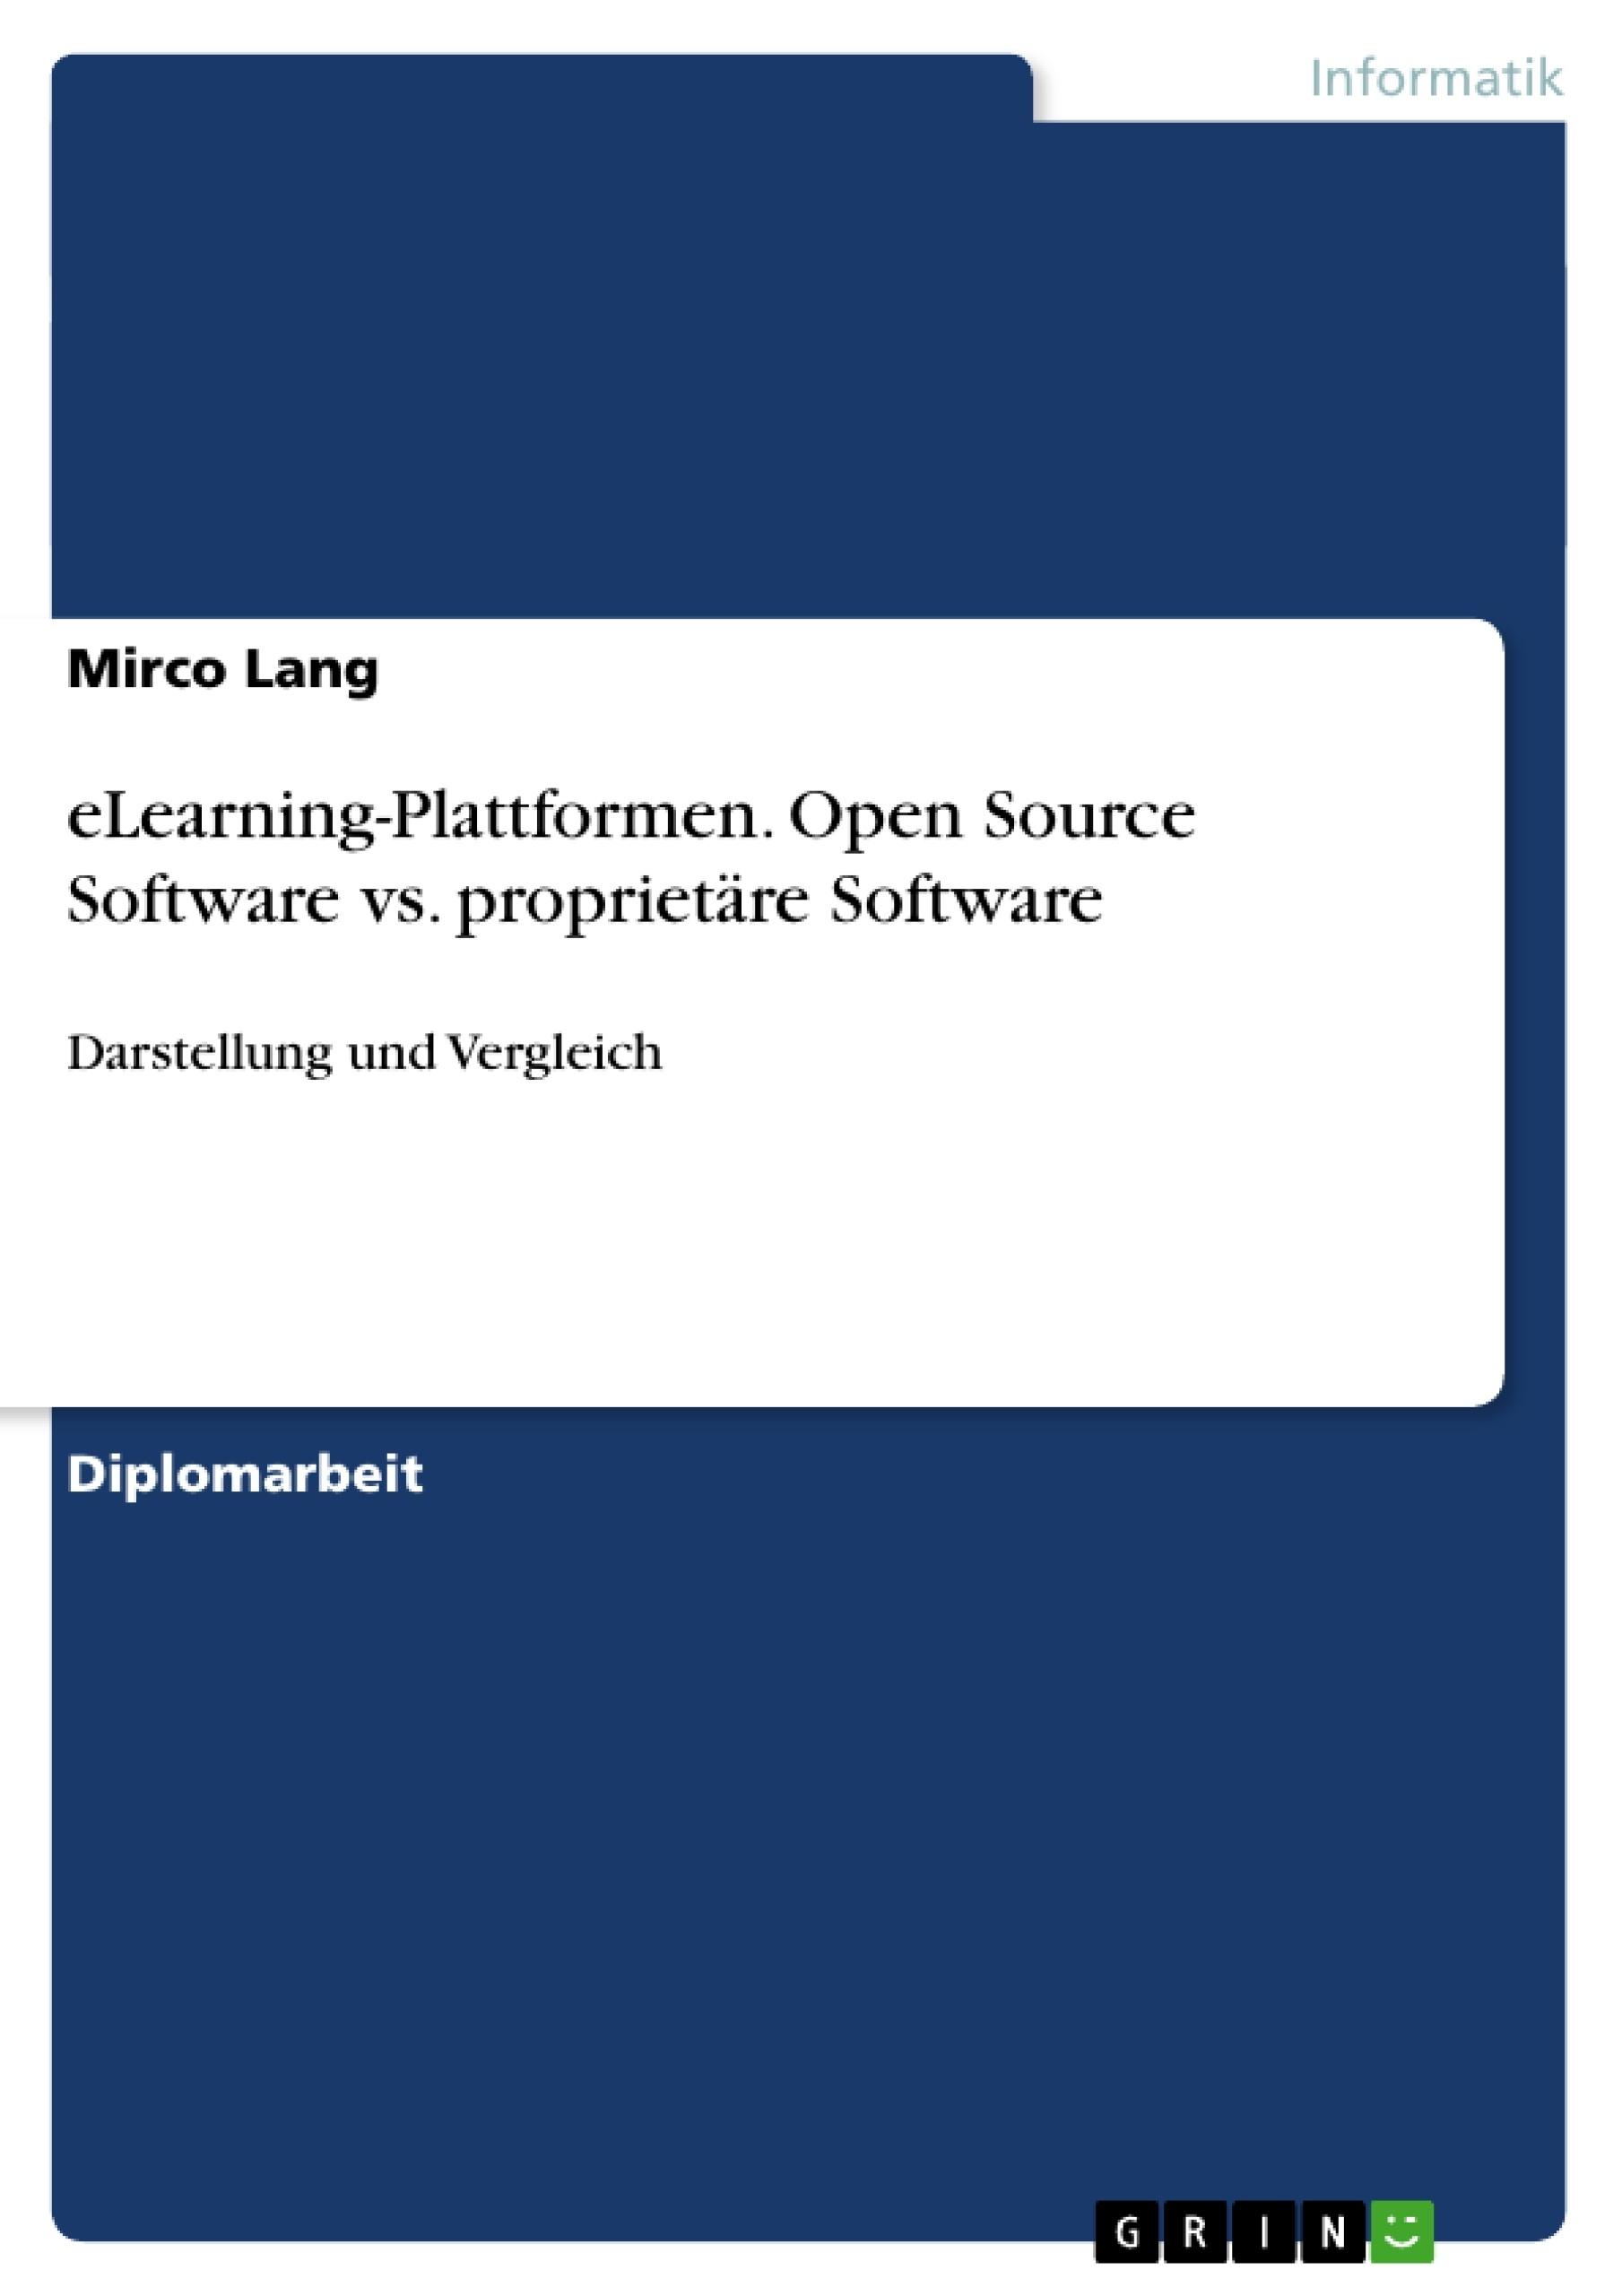 Titel: eLearning-Plattformen. Open Source Software vs. proprietäre Software